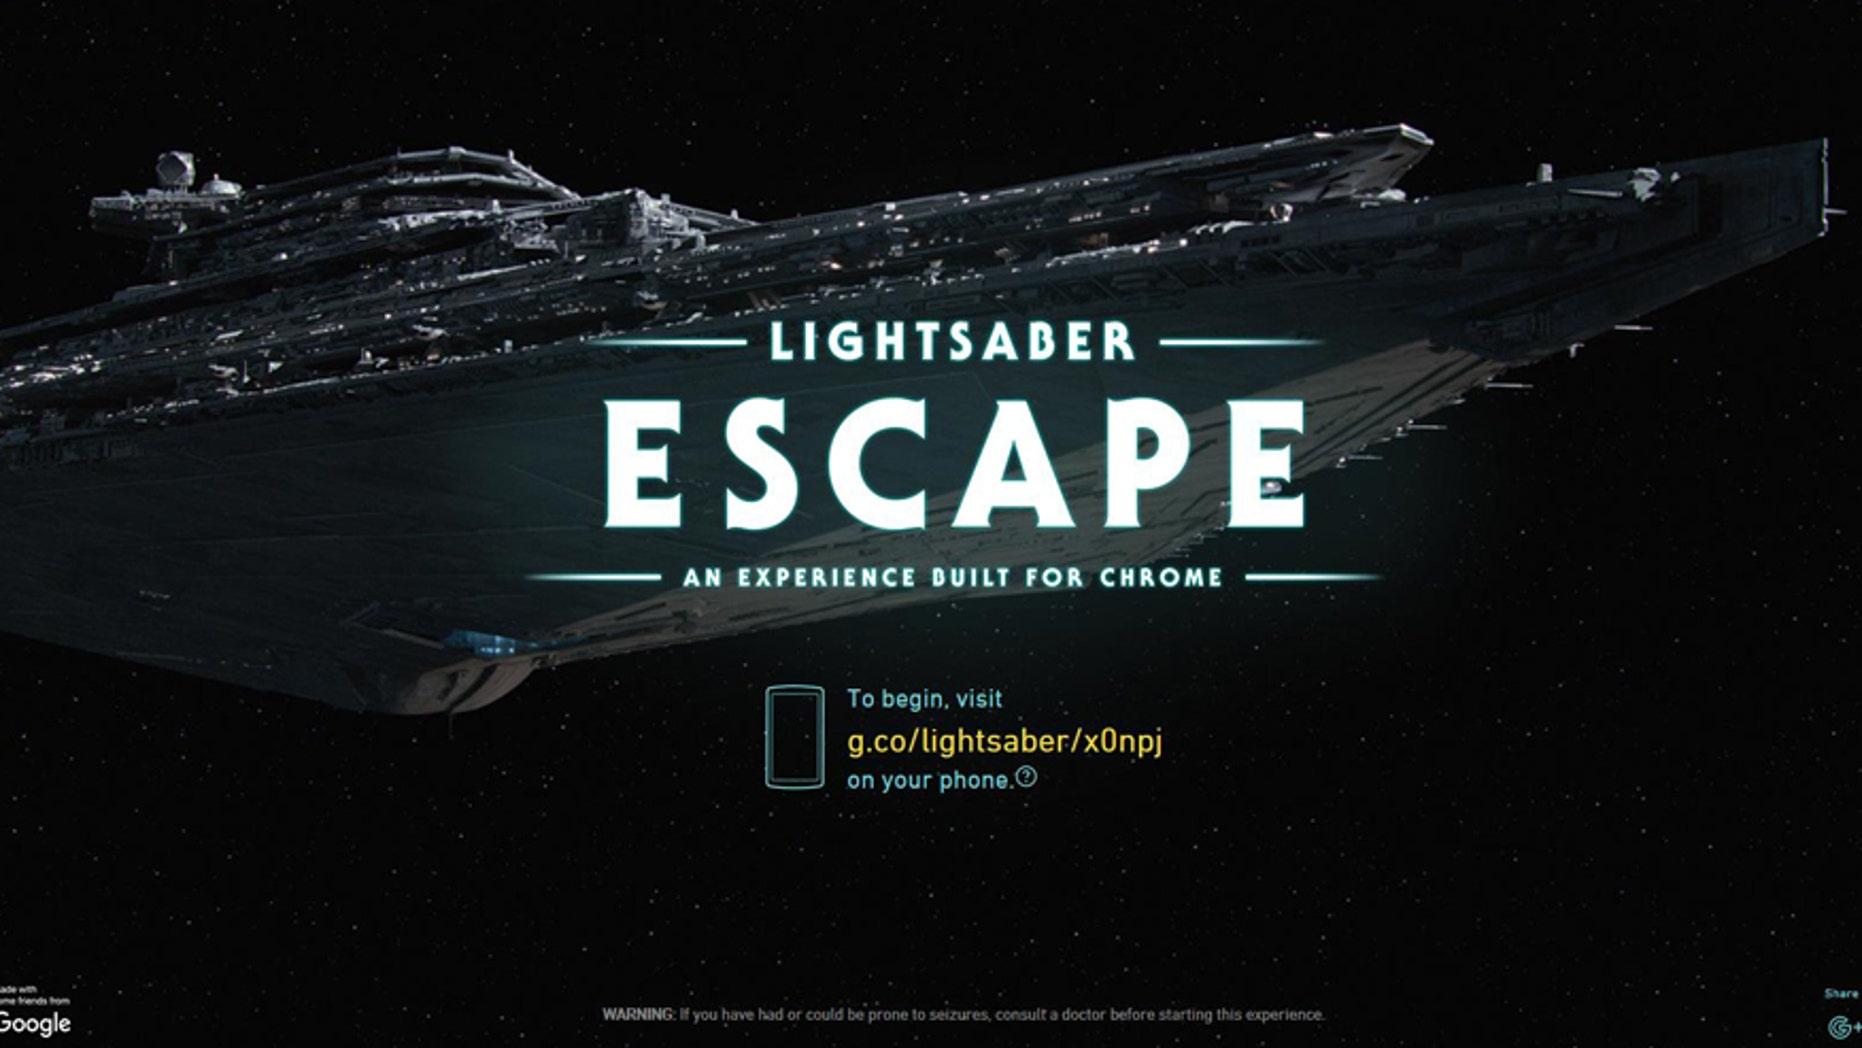 (Screenshot from www.lightsaber.withgoogle.com)